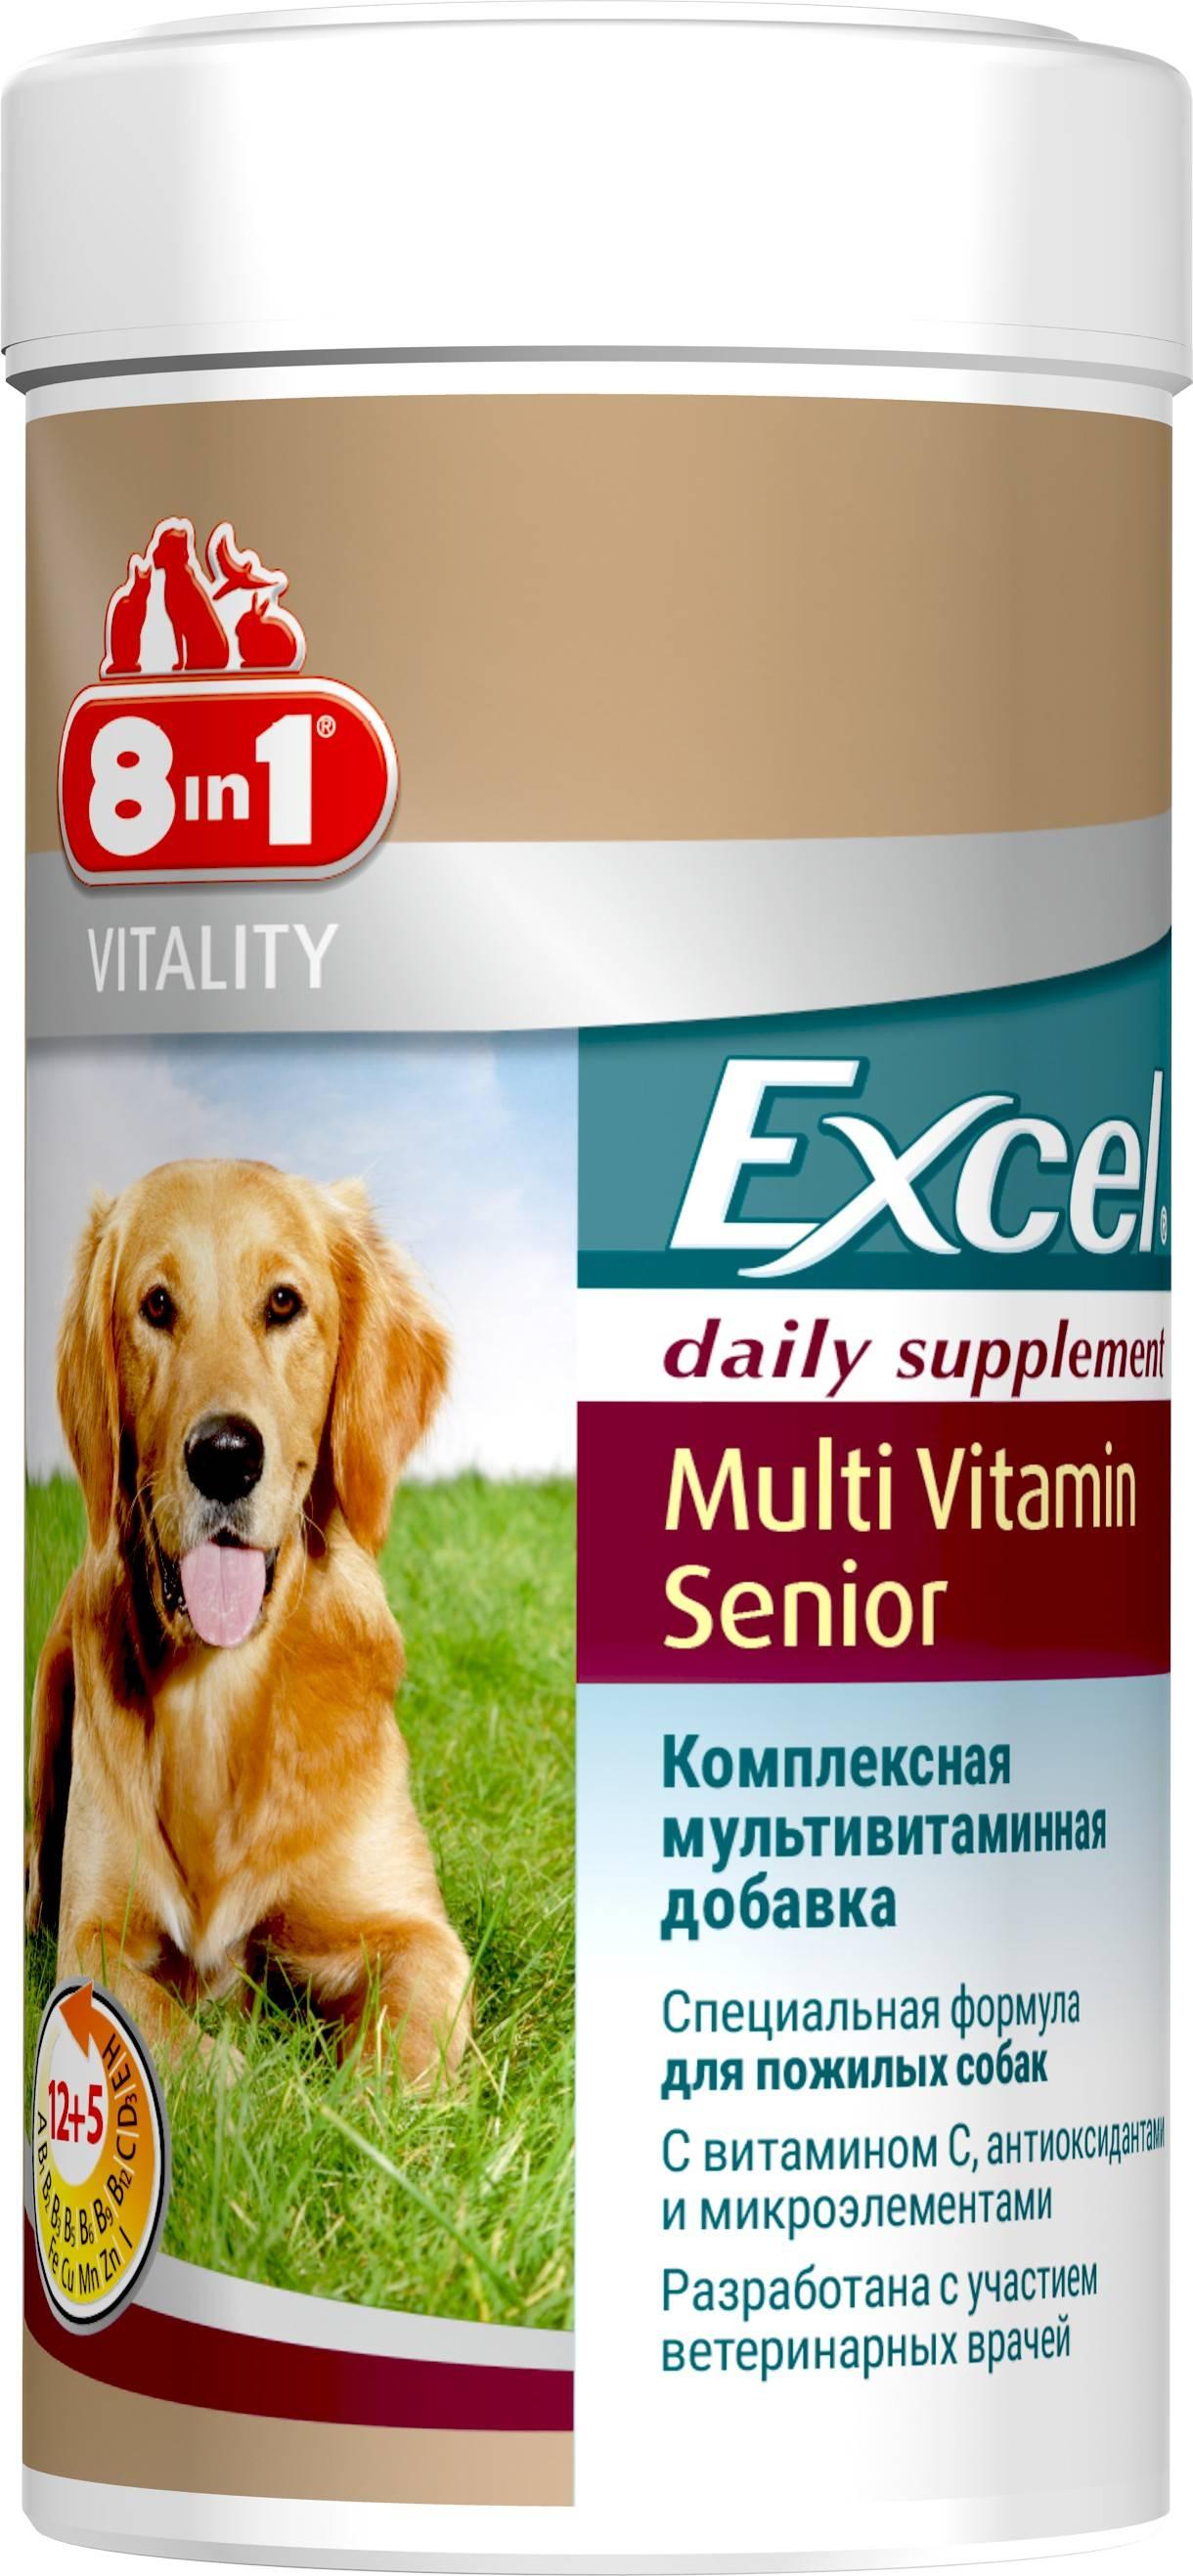 8in1 Excel Multi Vitamin Senior – мультивитаминный комплекс для пожилых собак